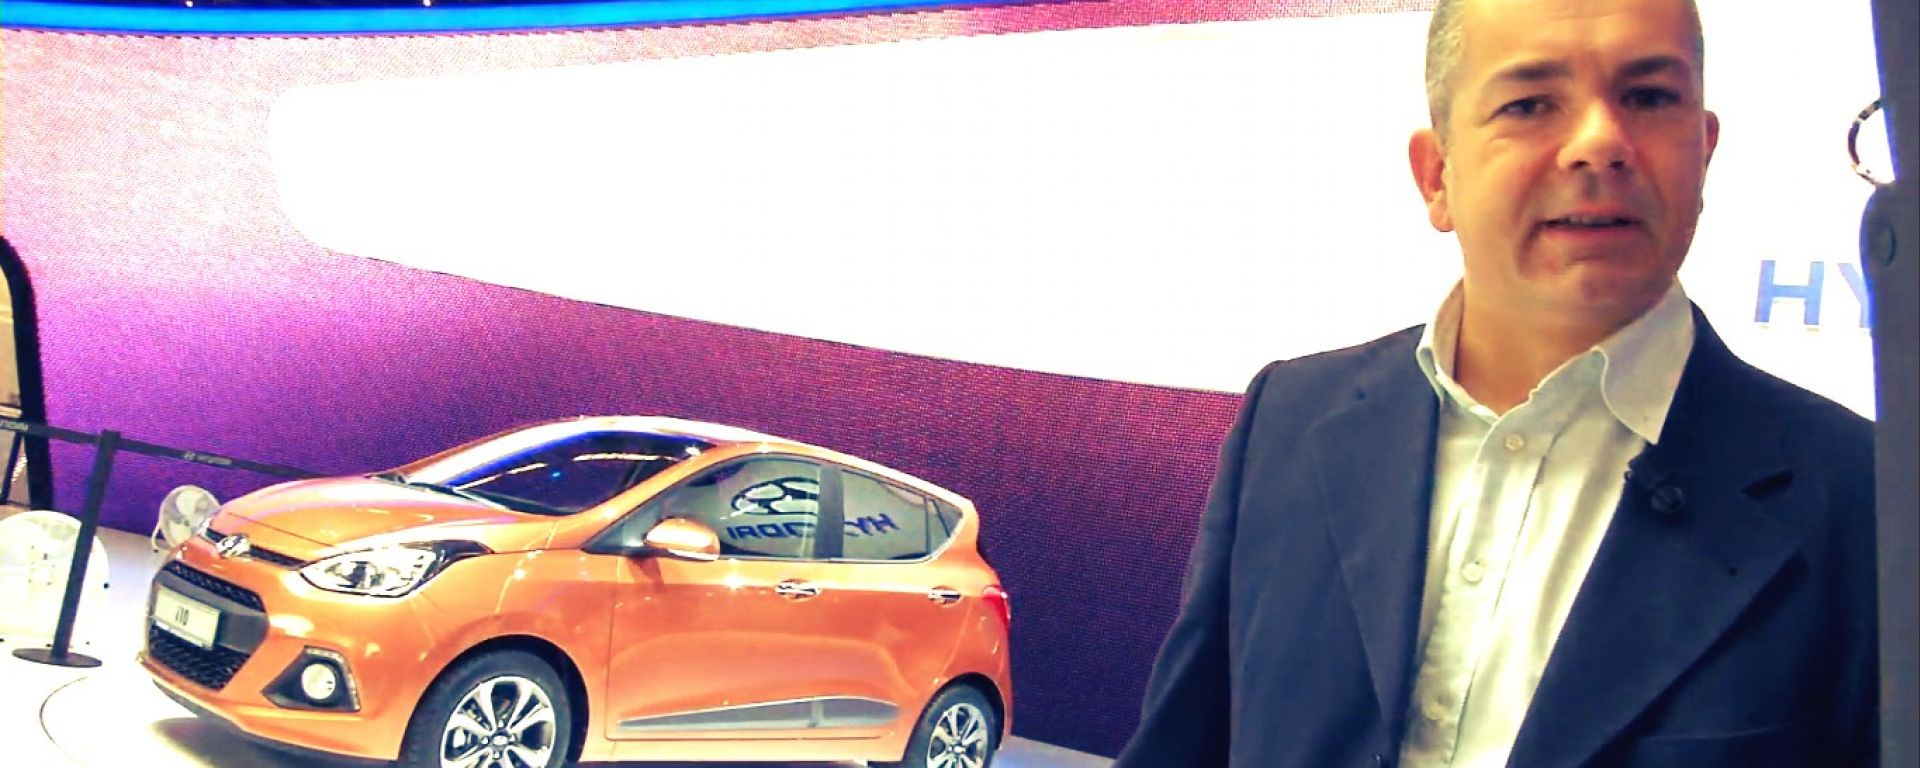 Francoforte 2013, lo stand Hyundai